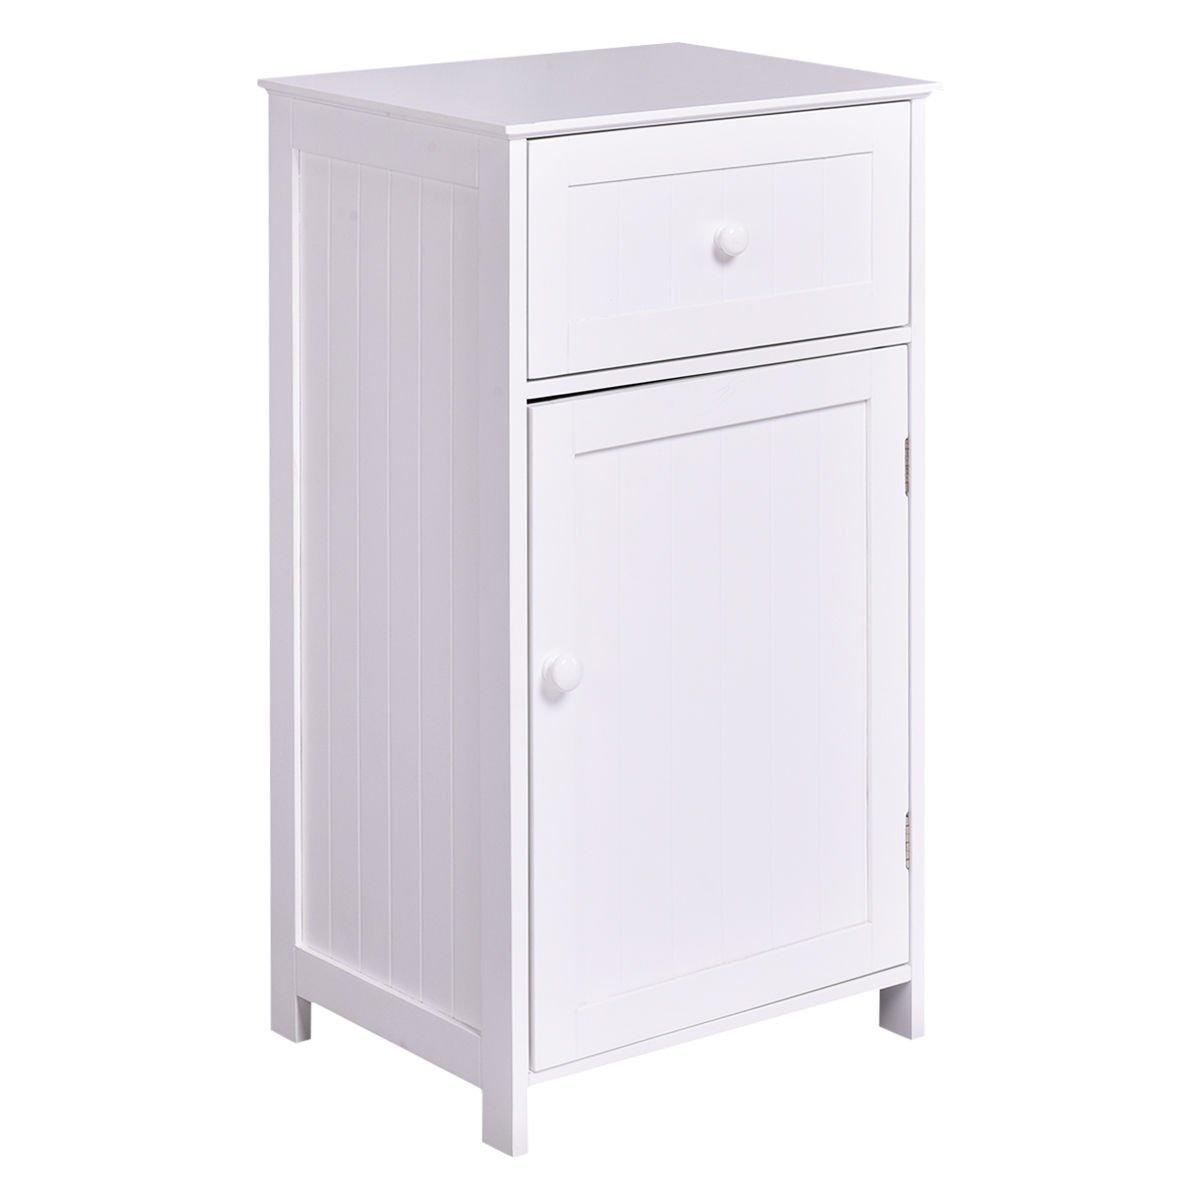 TANGKULA Floor Storage Cabinet Sturdy Wooden Modern Side Cabinet Organizer Home Office Living Room Bedroom Bathroom Furniture with Door & Drawer